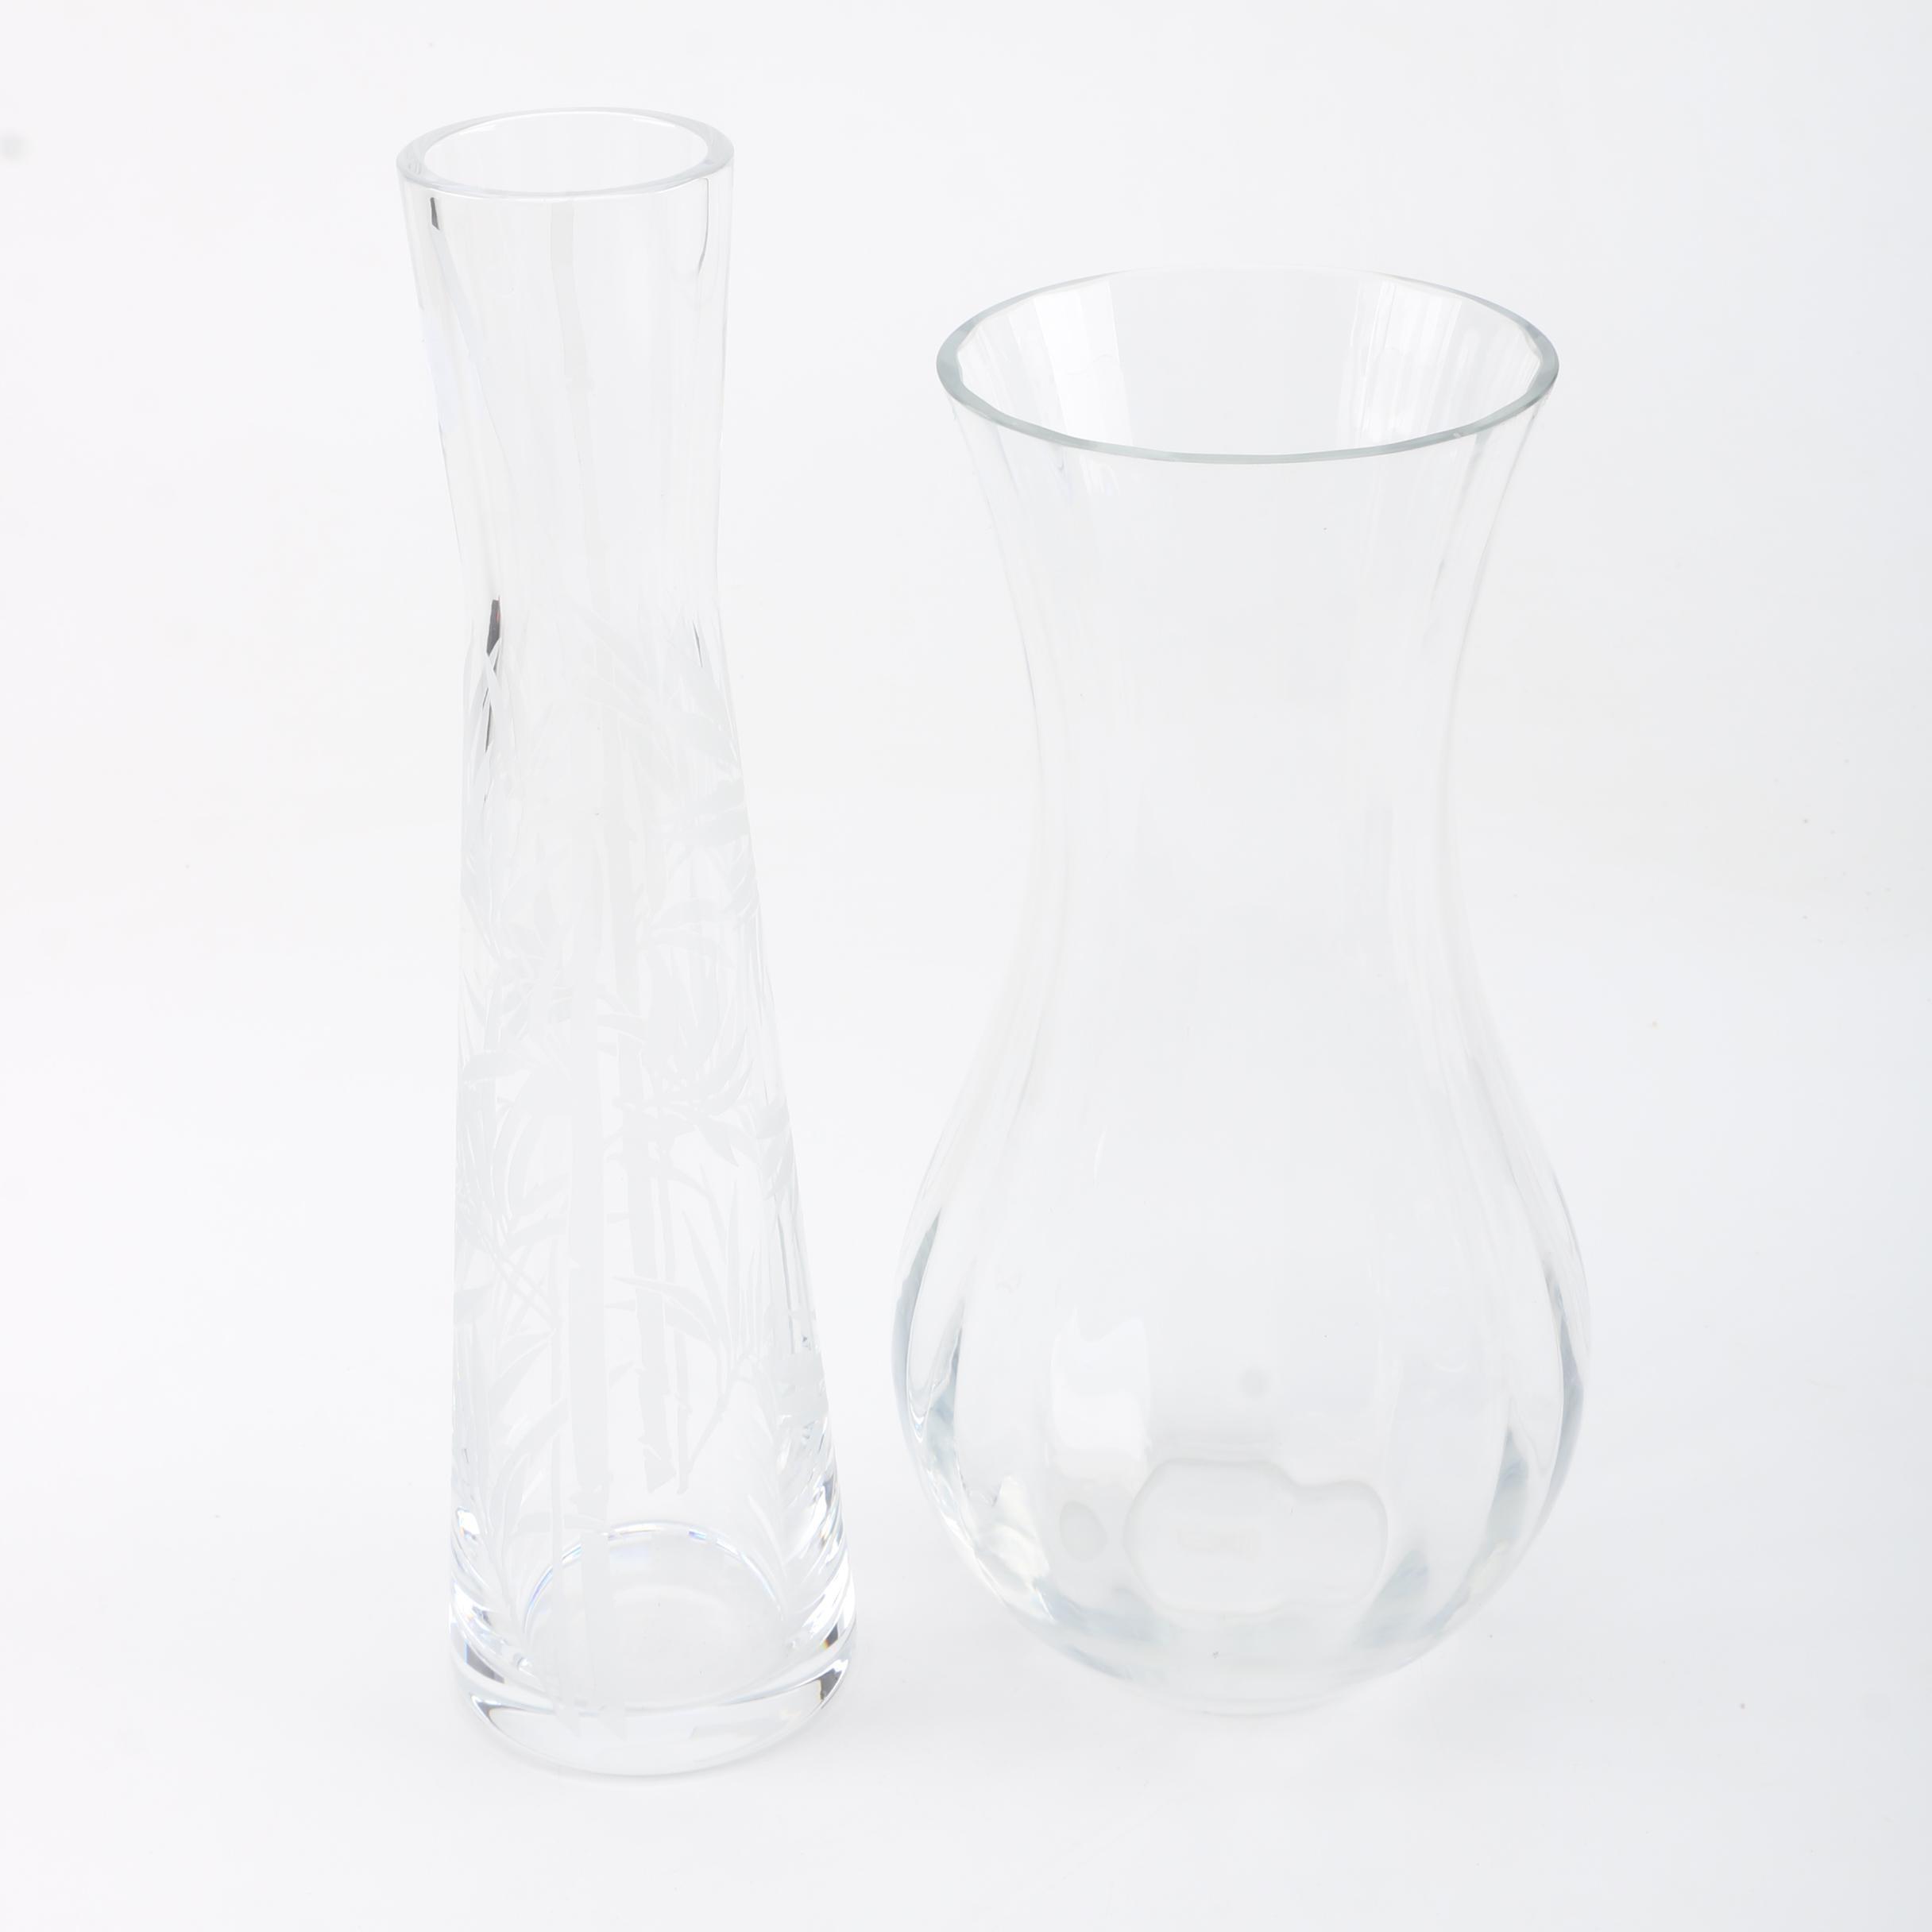 Baccarat Crystal Vases